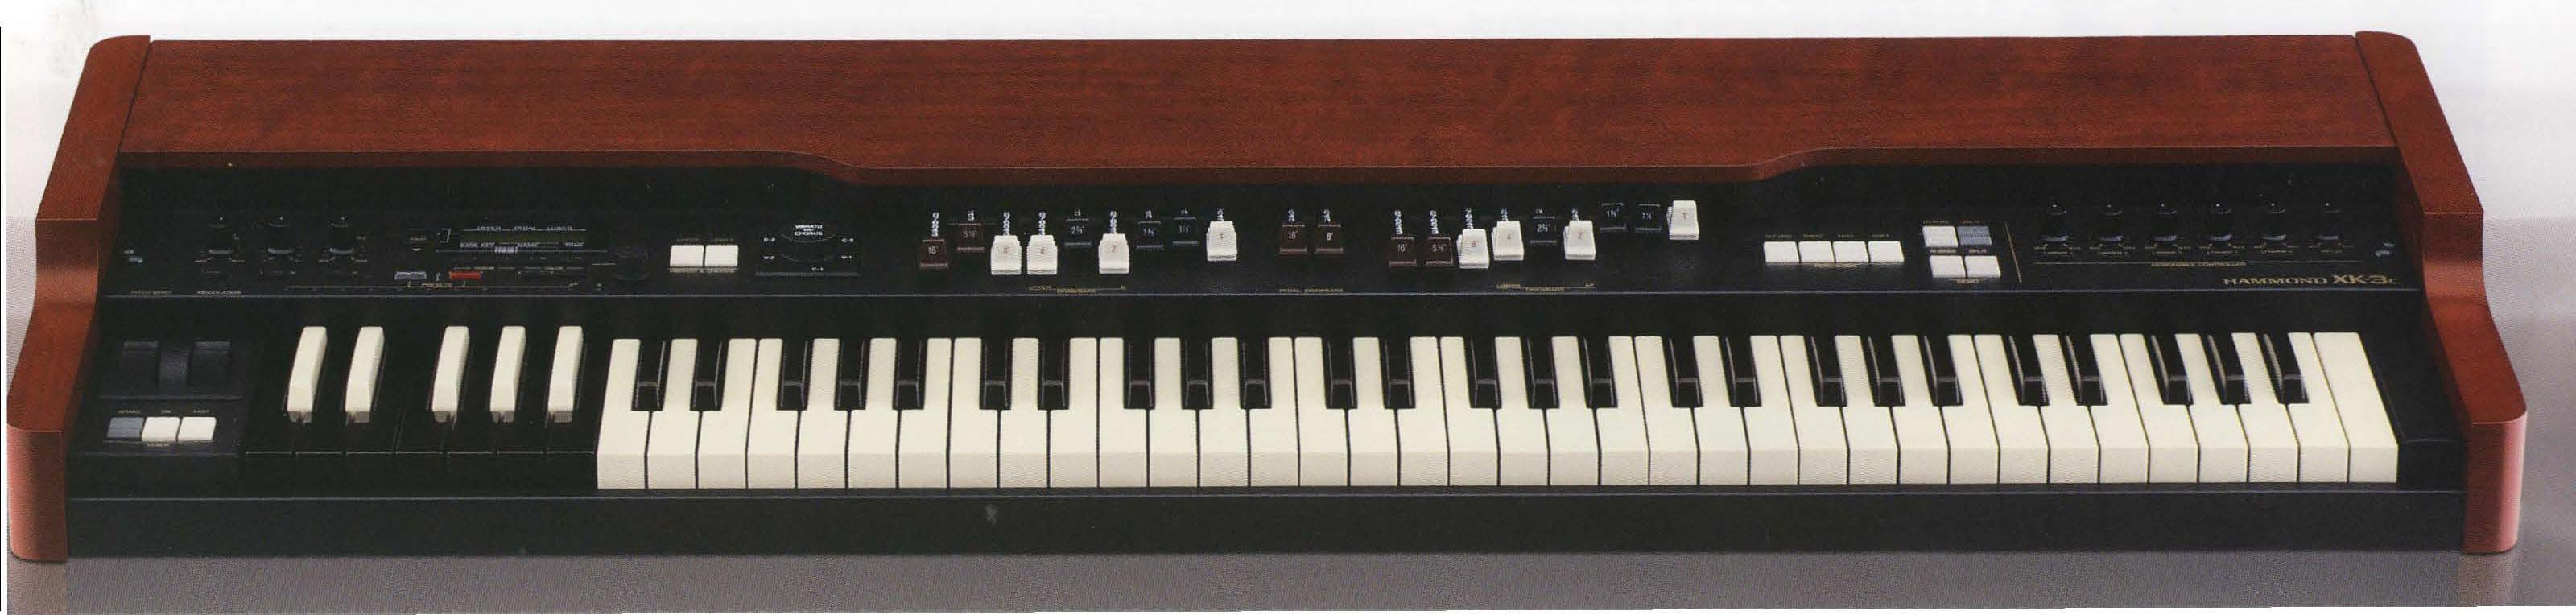 Hammond XK3C Organ ~ drum sets and keyboard